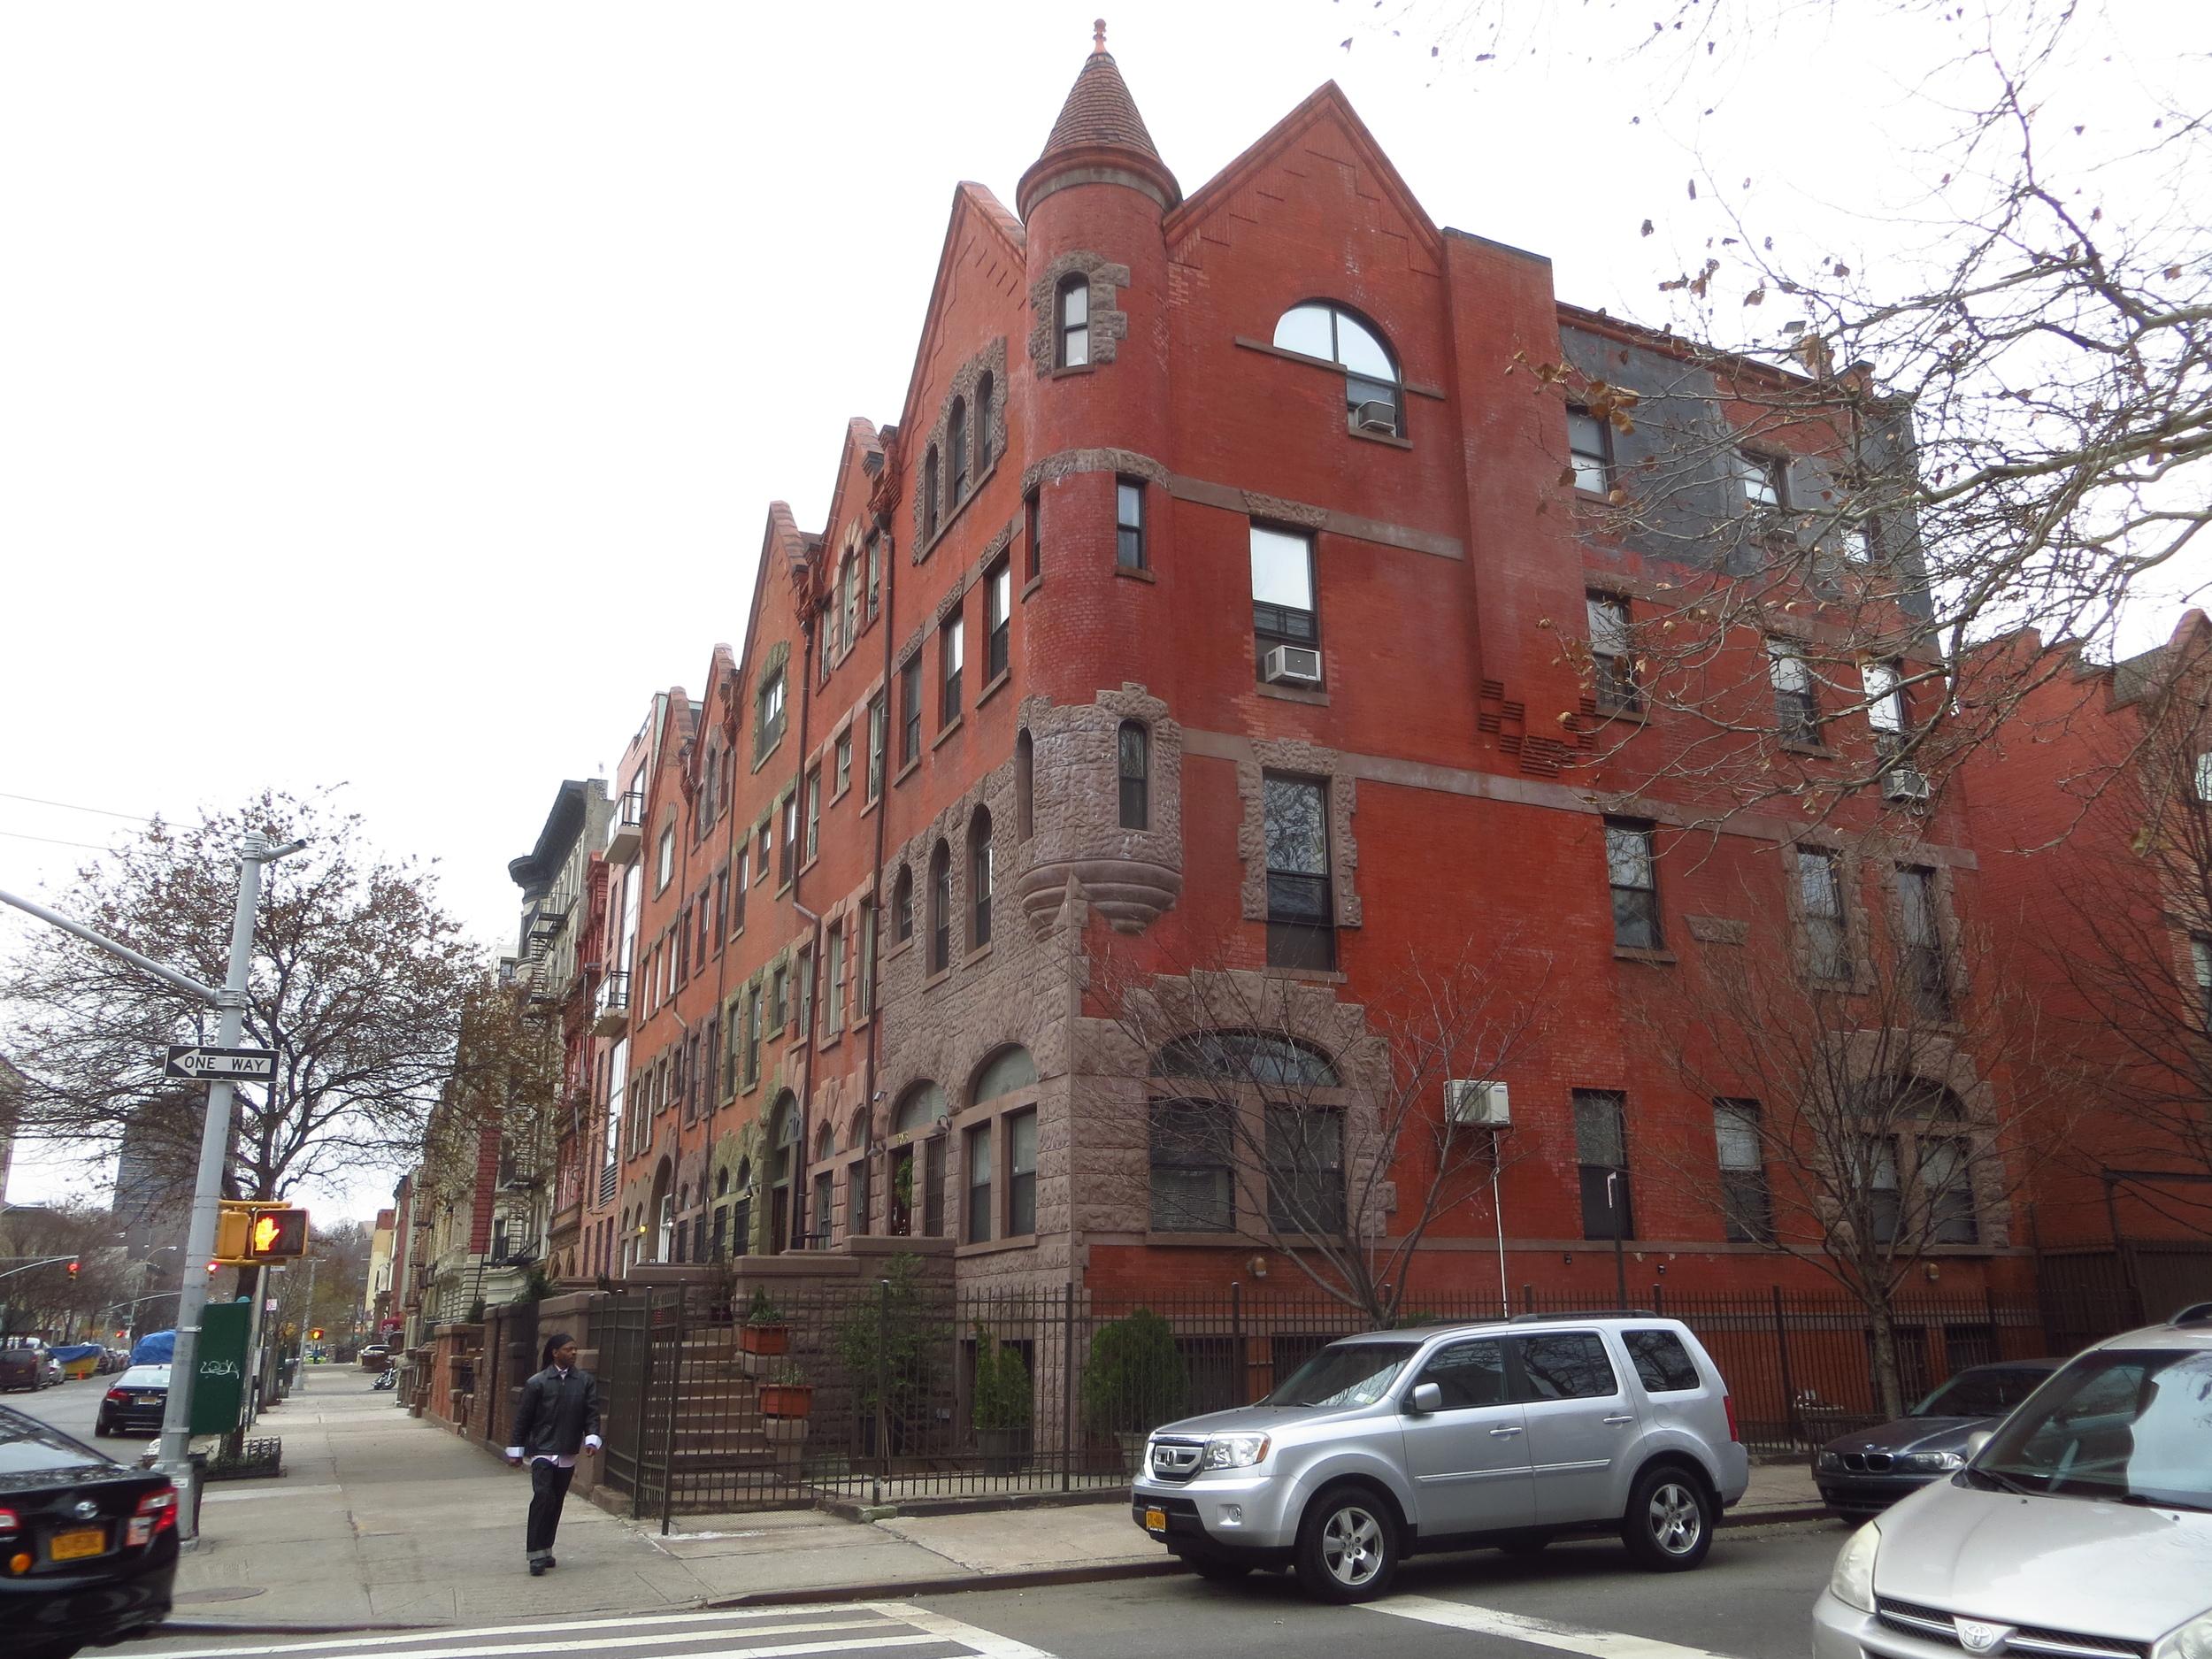 More Harlem homes